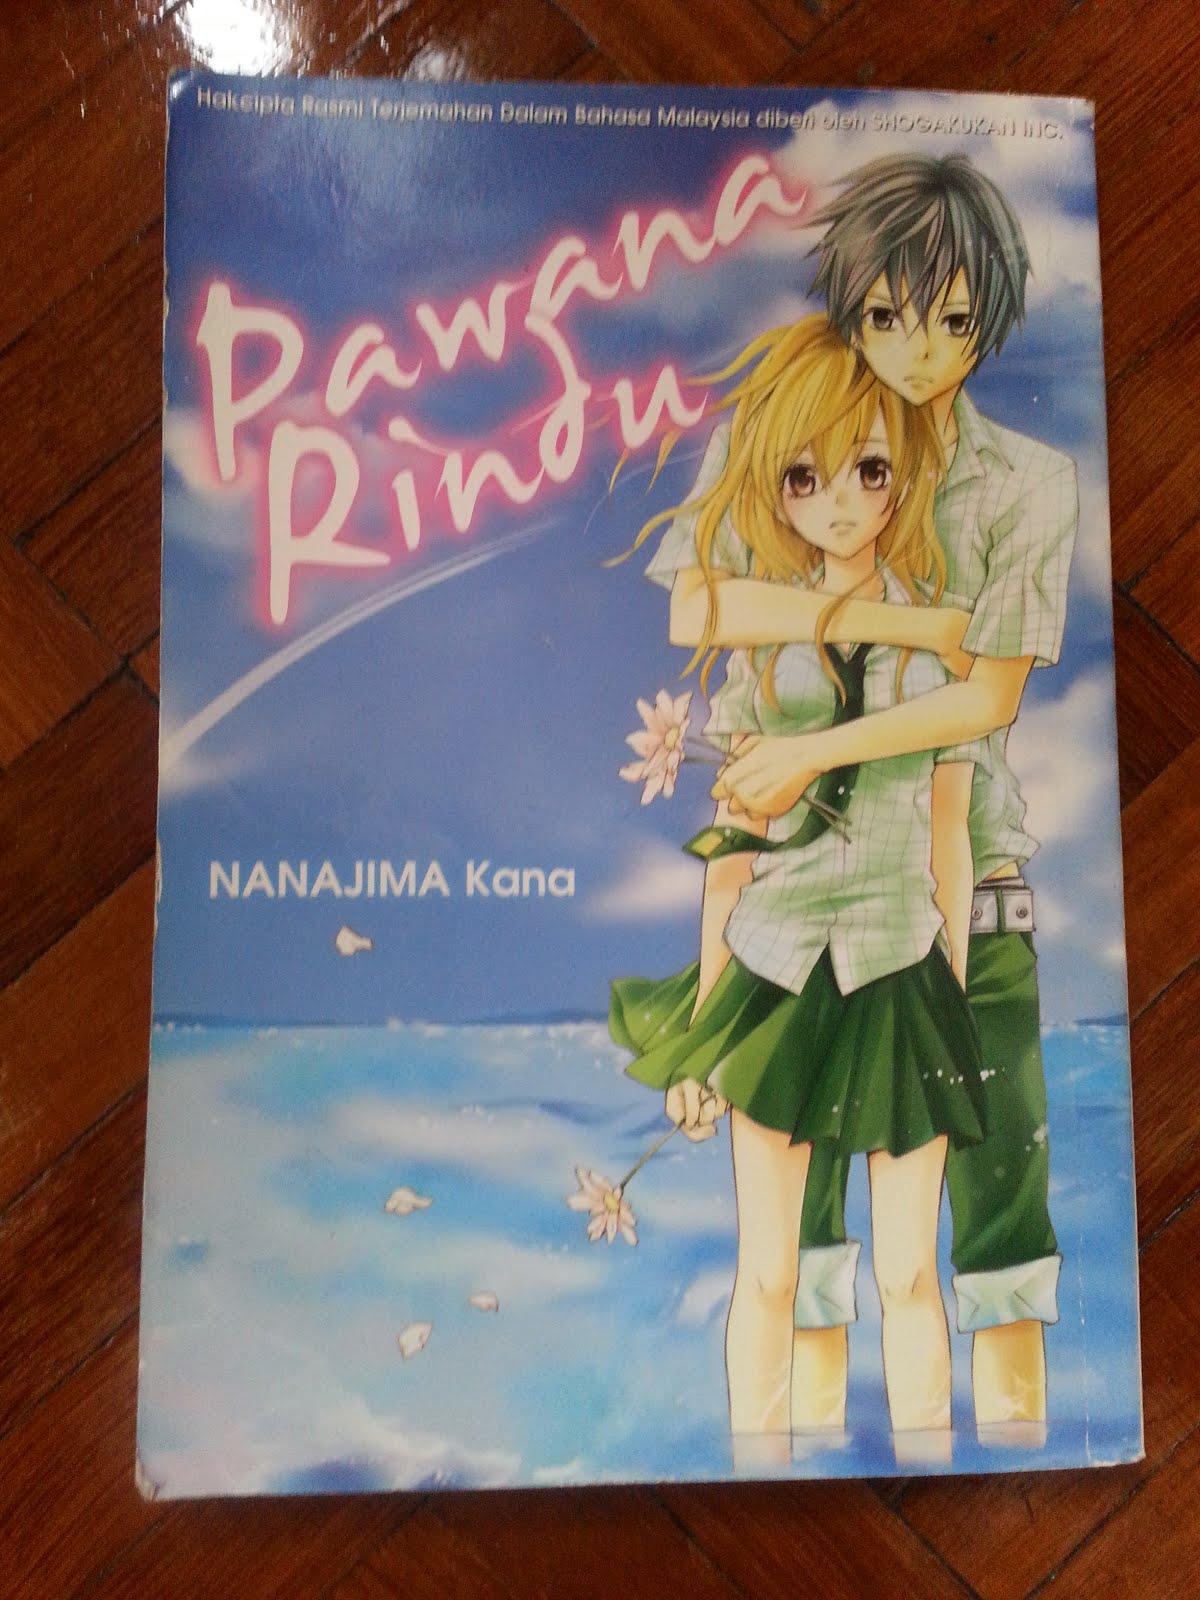 Gagahnya Kelab Manik, Pawana Rindu  Shoujo Manga (pengantin Perempuan  Diketepikan)